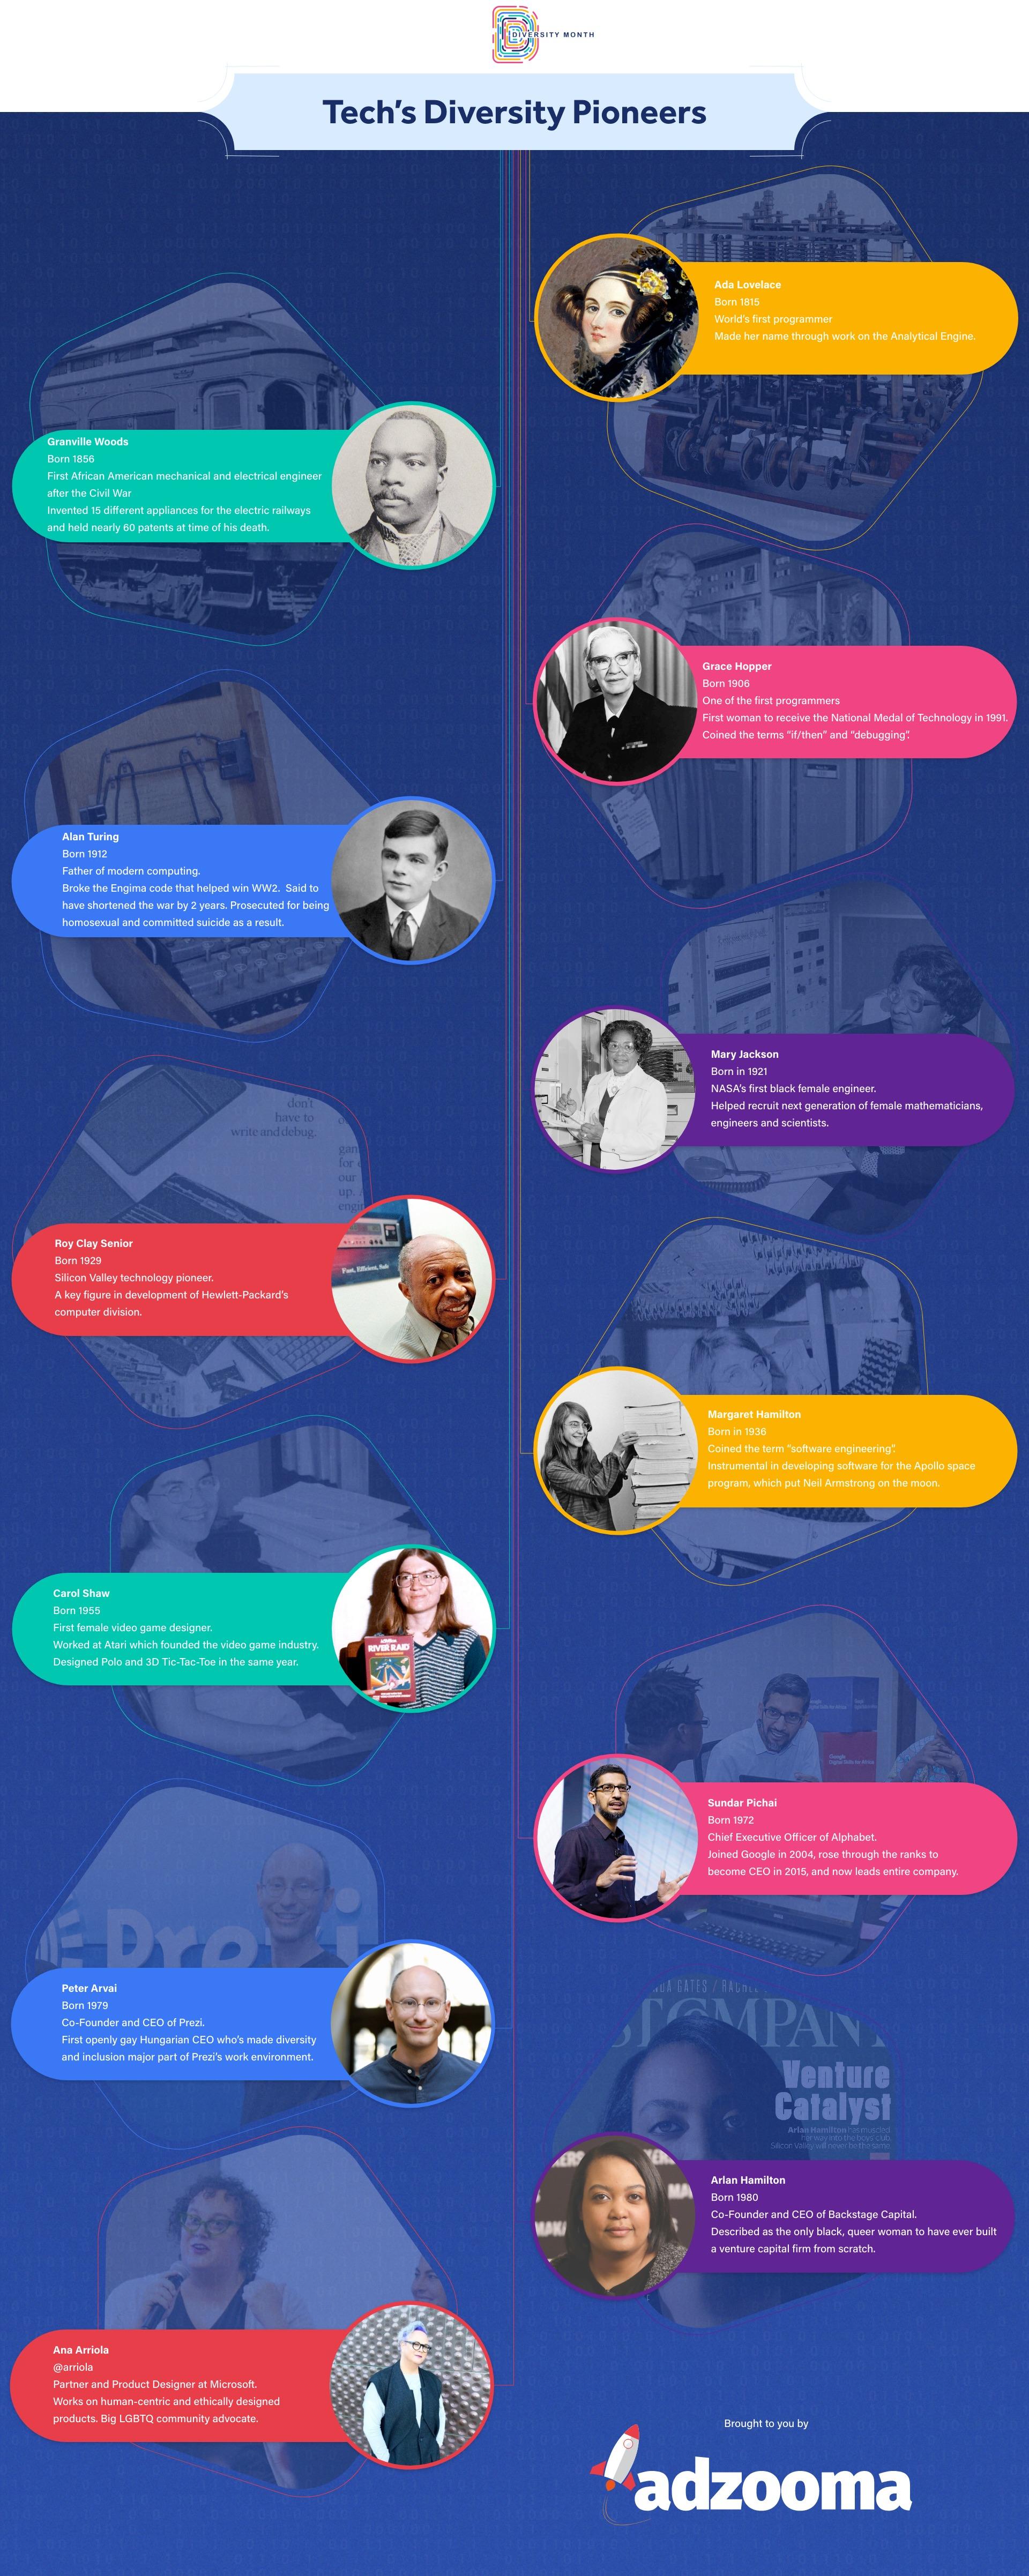 Tech's Diversity Pioneers infographic